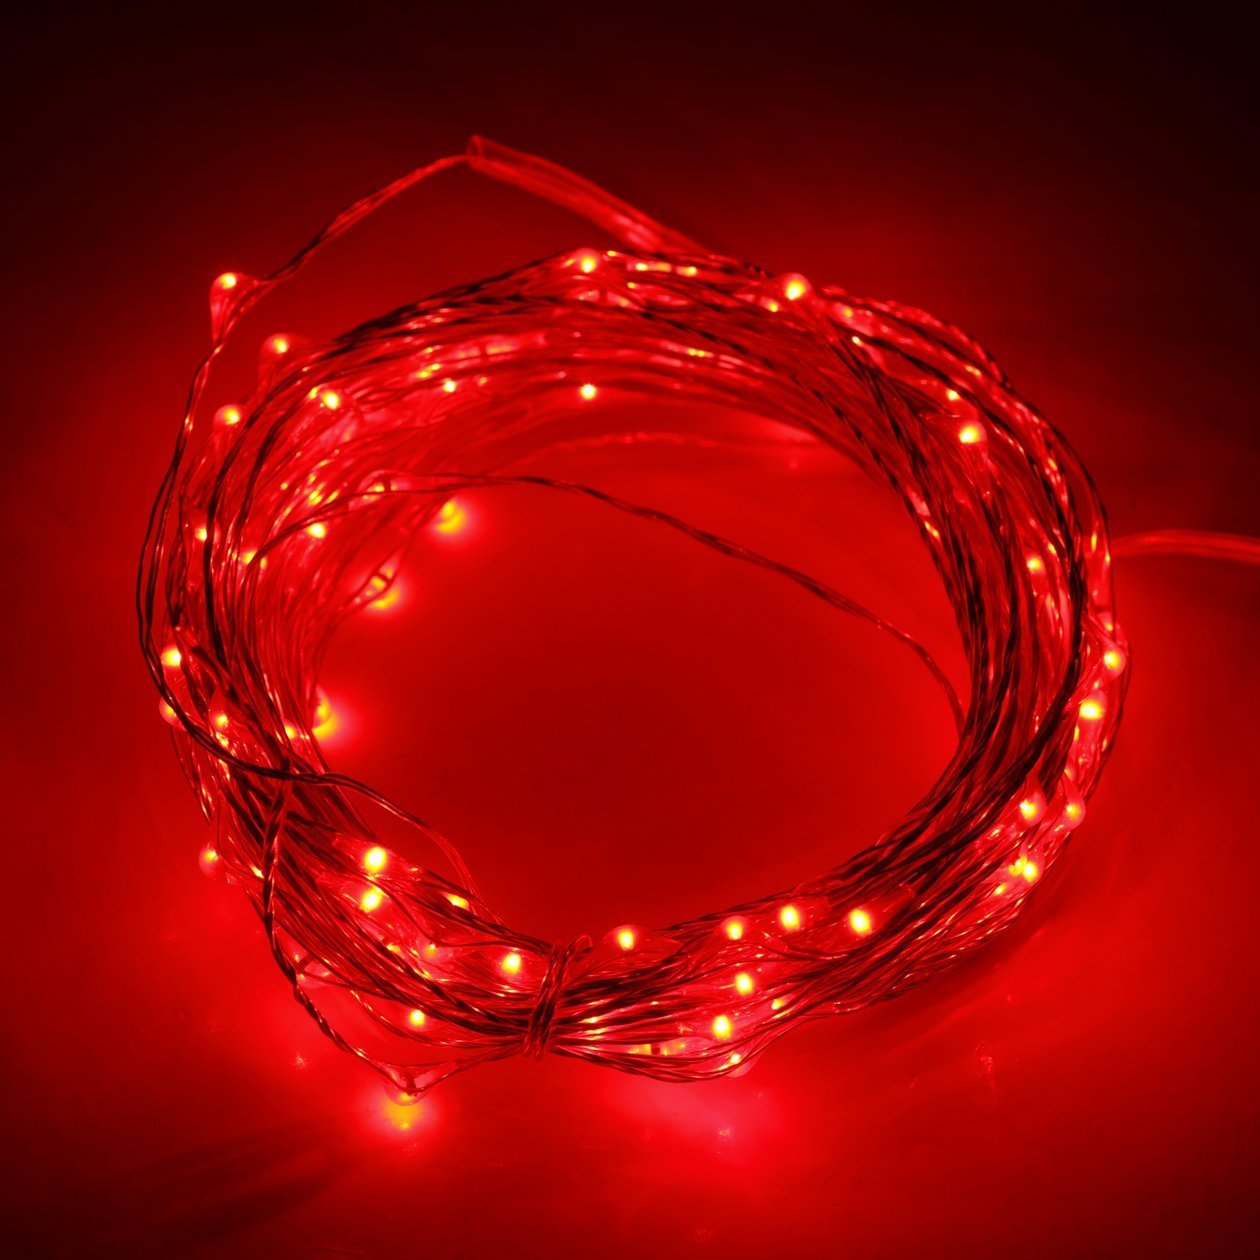 Ryham LED luci della stringa Luce di Natale 30 LED 3M luci 9.8ft esterna coperta impermeabile stellata String filo di rame, Rosso Ryham Optoelectronics Co. Limited